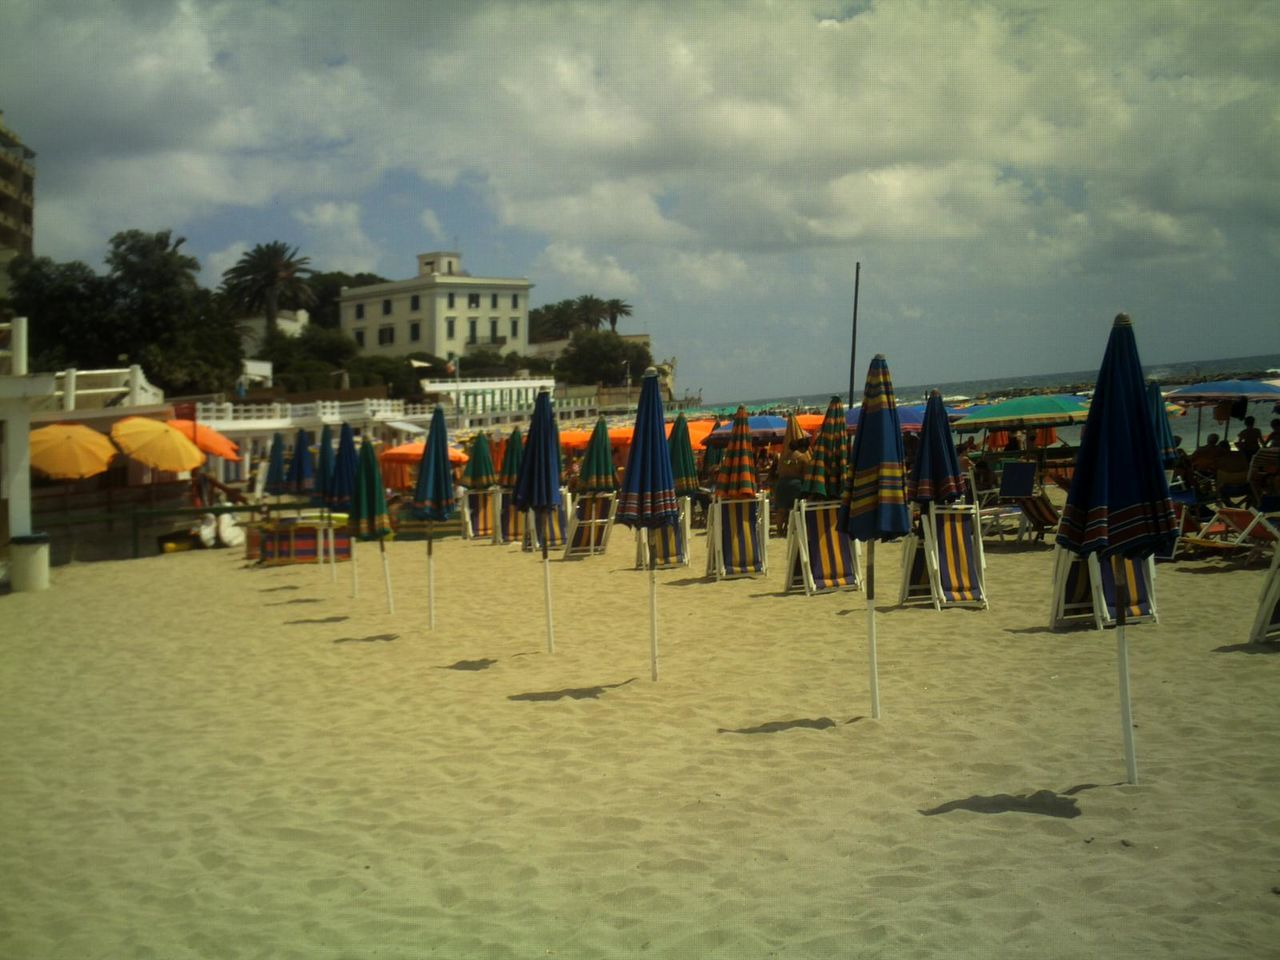 Beach Umbrellas On Beach